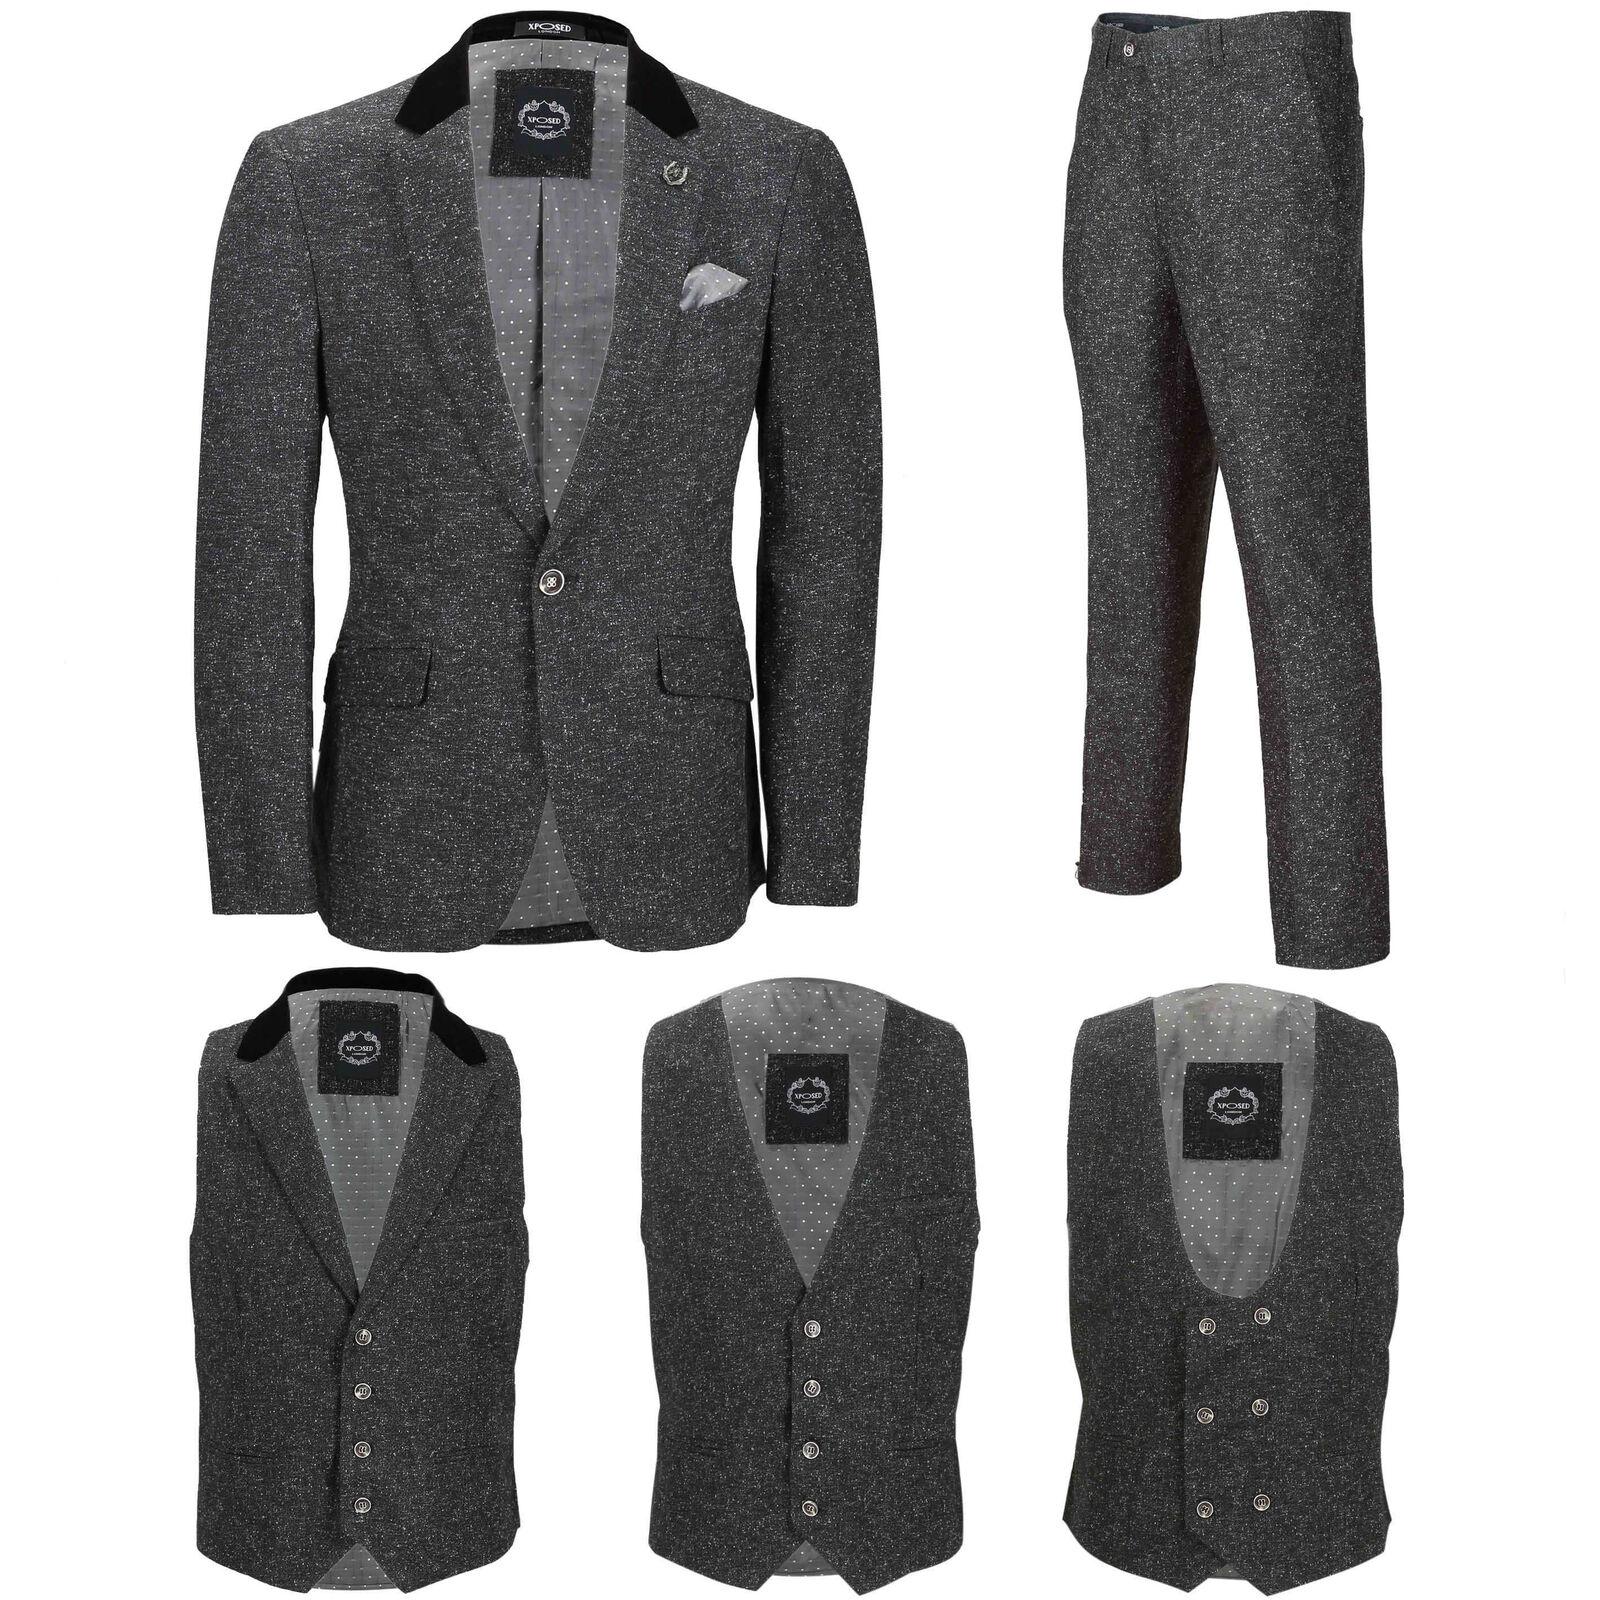 Mens Grey Tweed Wool 3 Piece Suit Sold Separately Retro Blazer Waistcoat Trouser